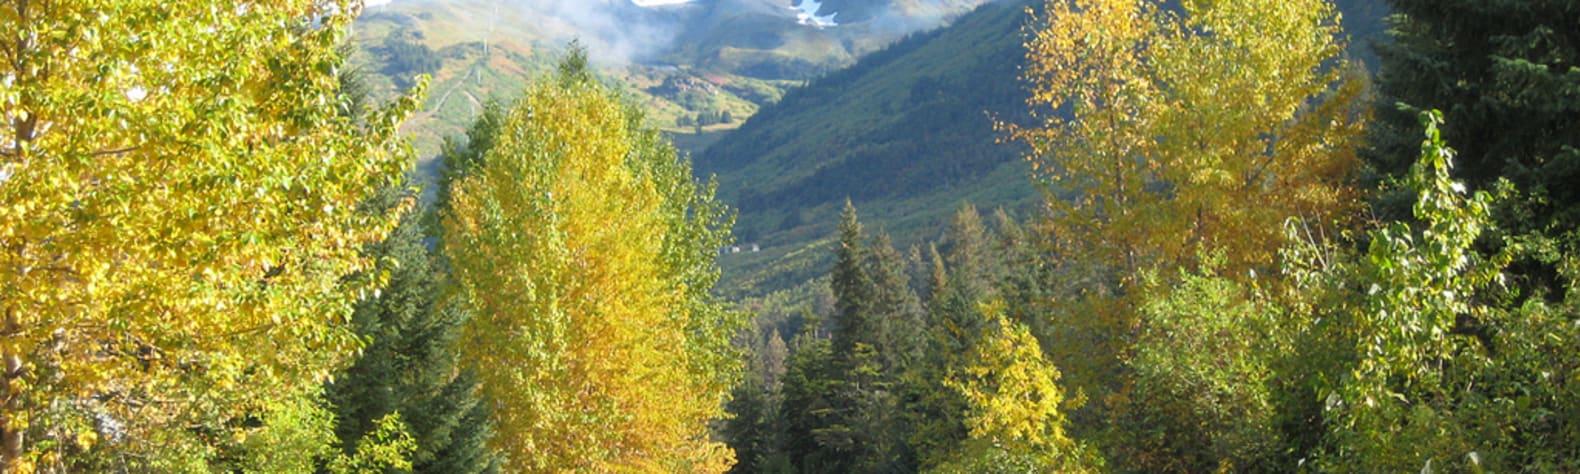 Chugach National Forest